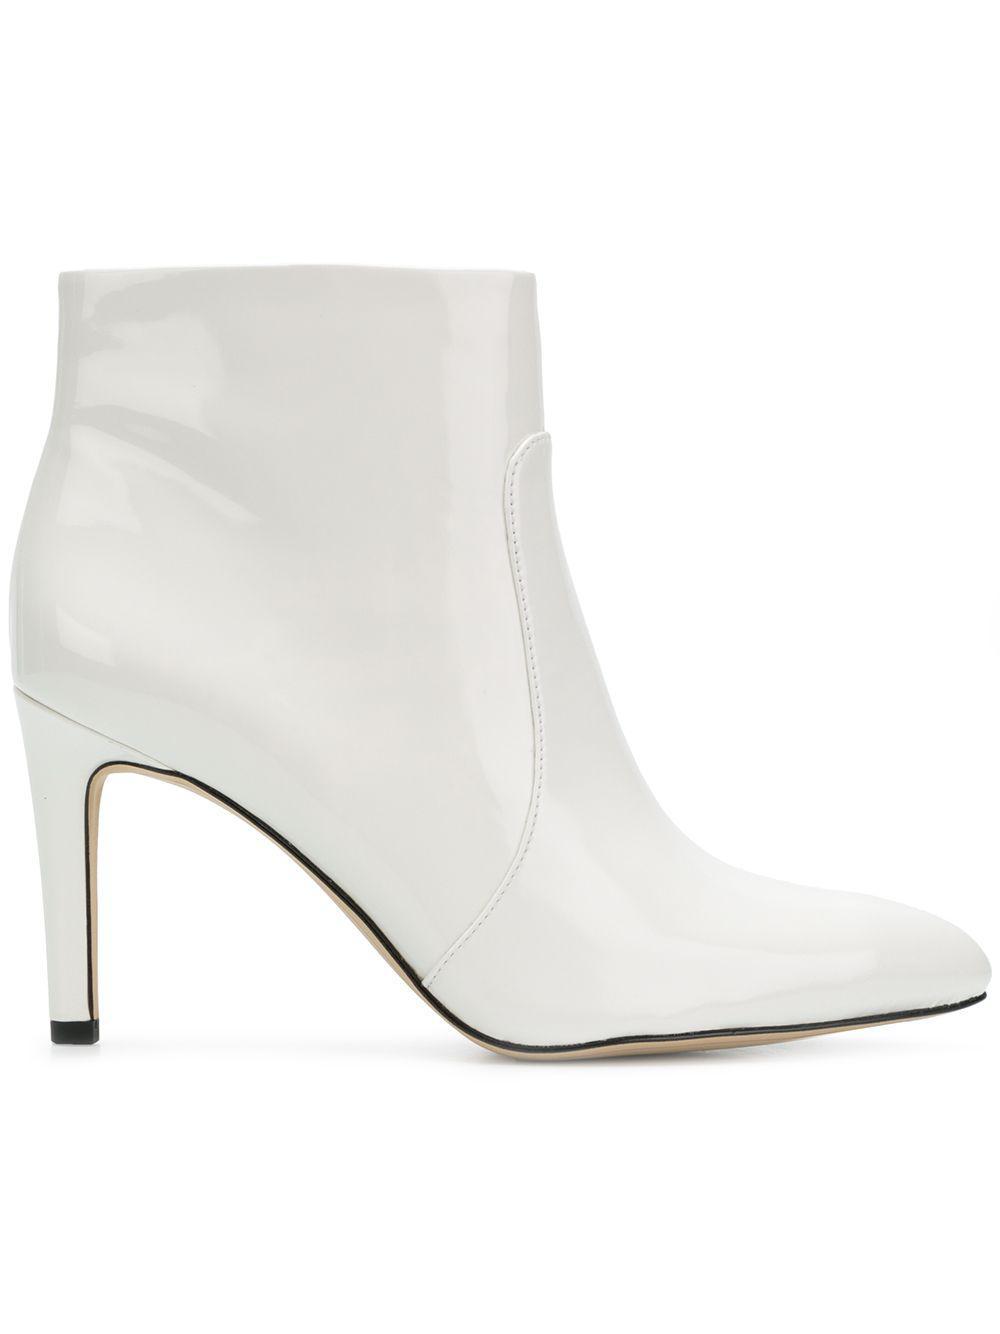 06da2637228c39 Lyst - Sam Edelman Olette Ankle Boots in White